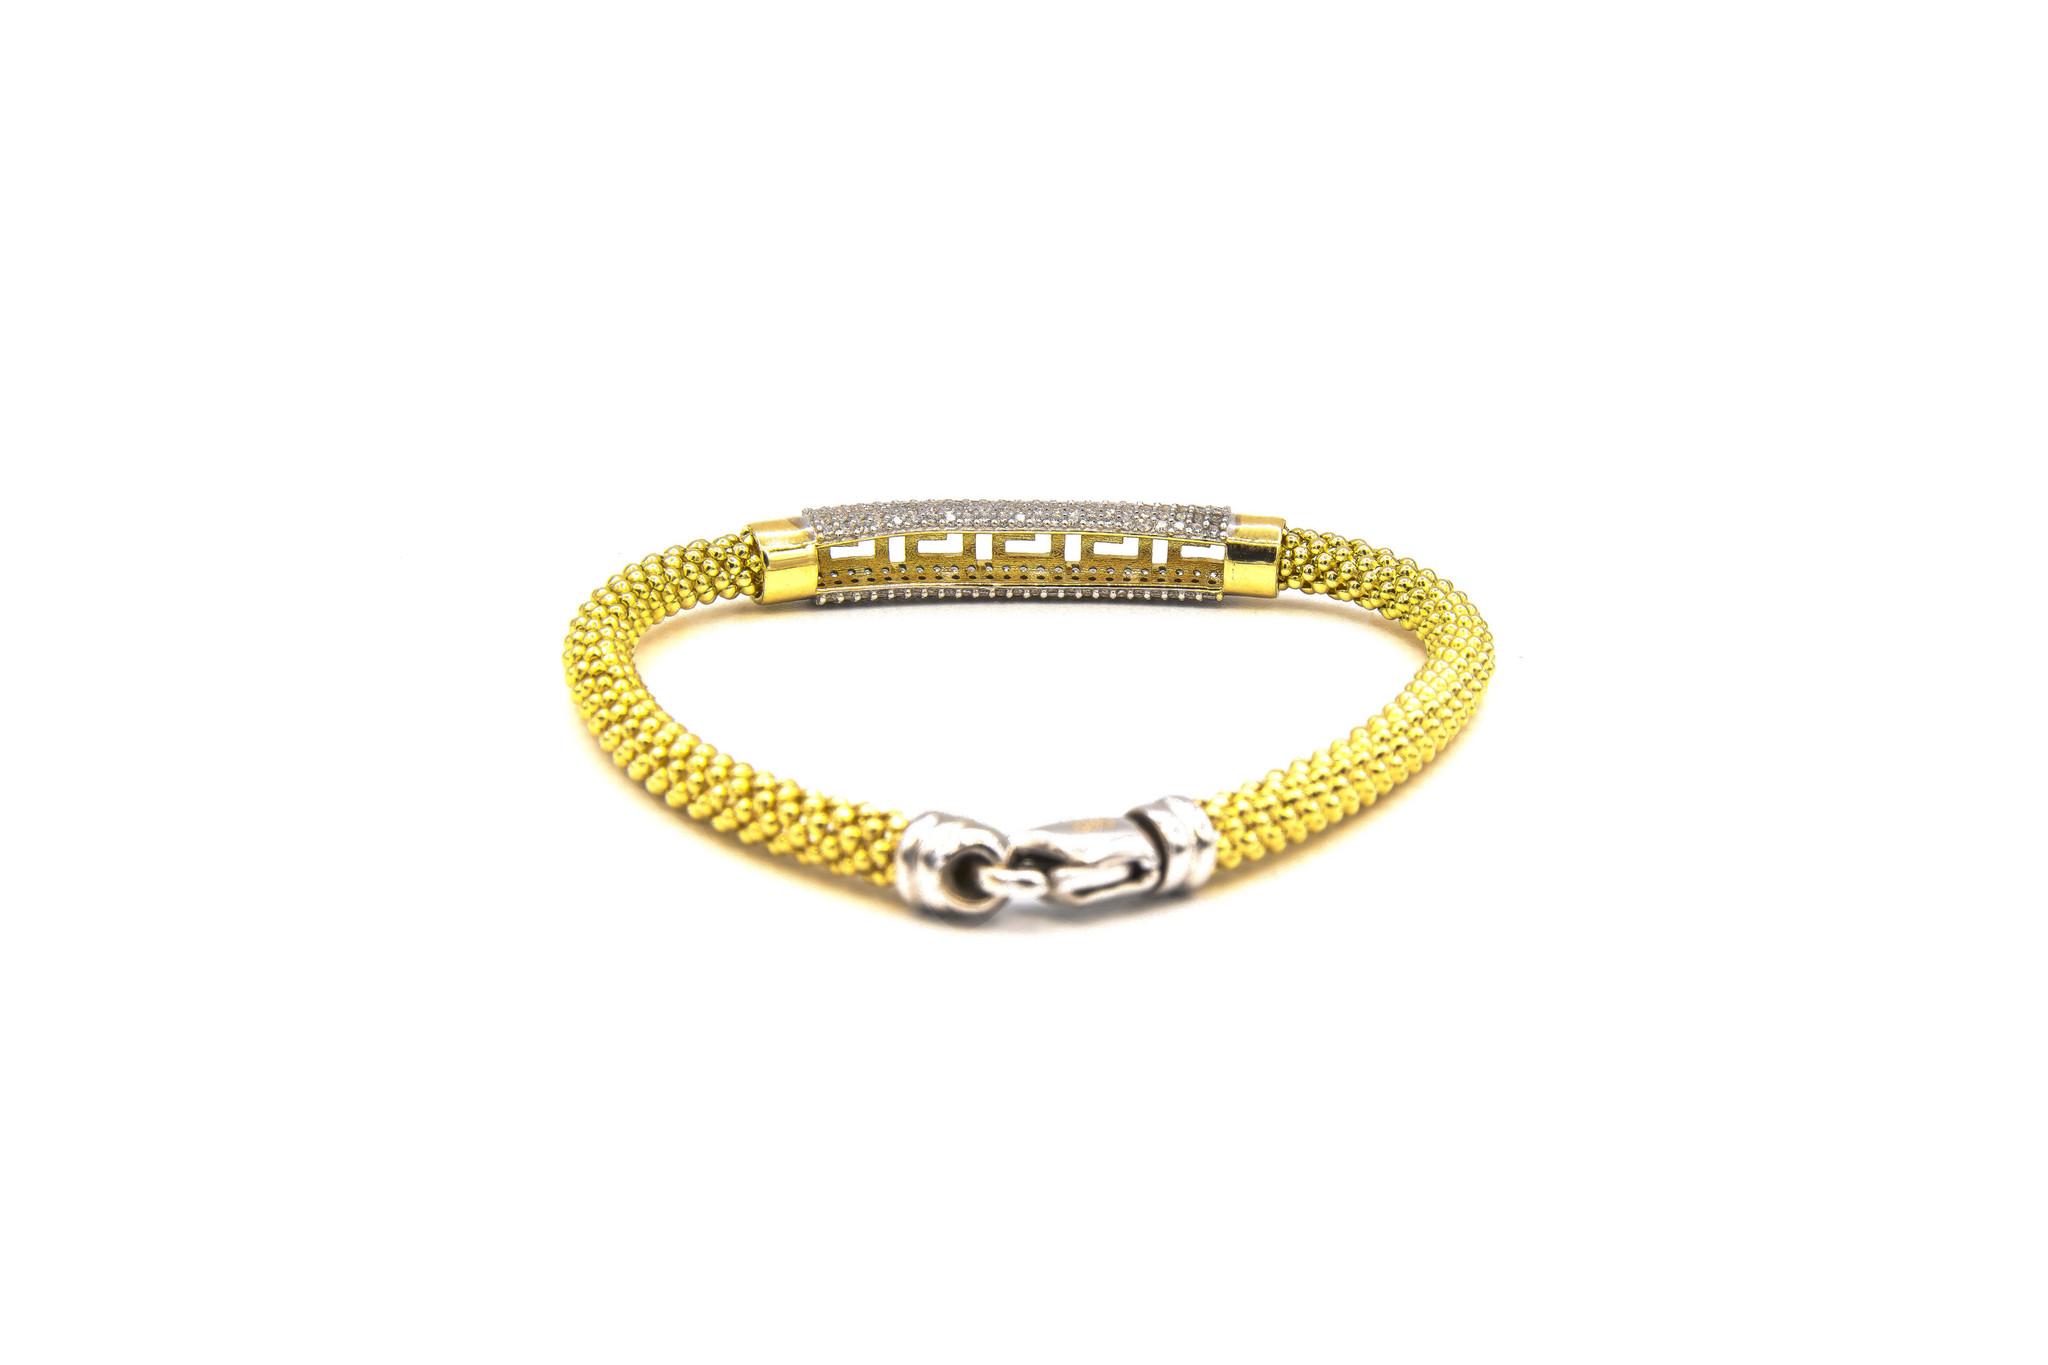 Armband halve slavenband versace met zirkonia's en flexibele boto ketti-3